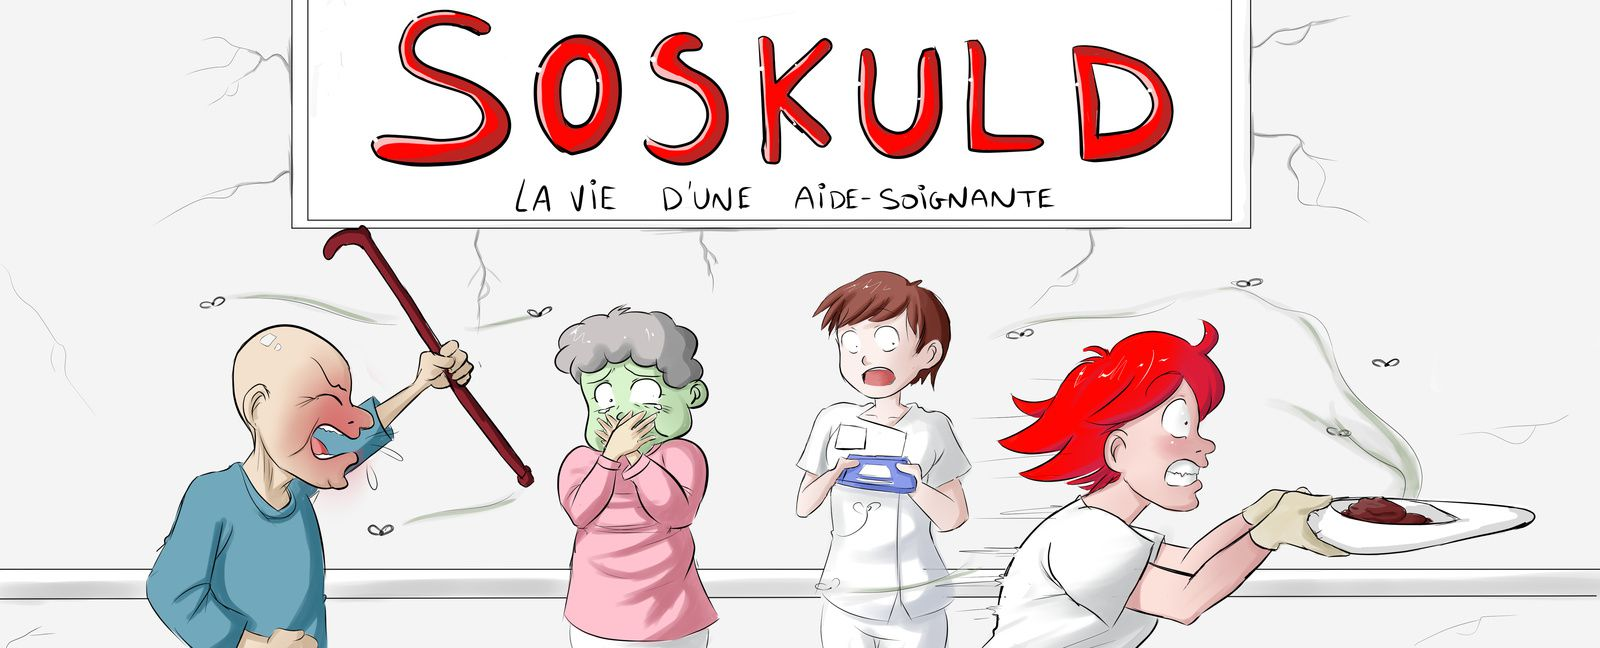 SoSkuld, la vie d'une aide-soignante